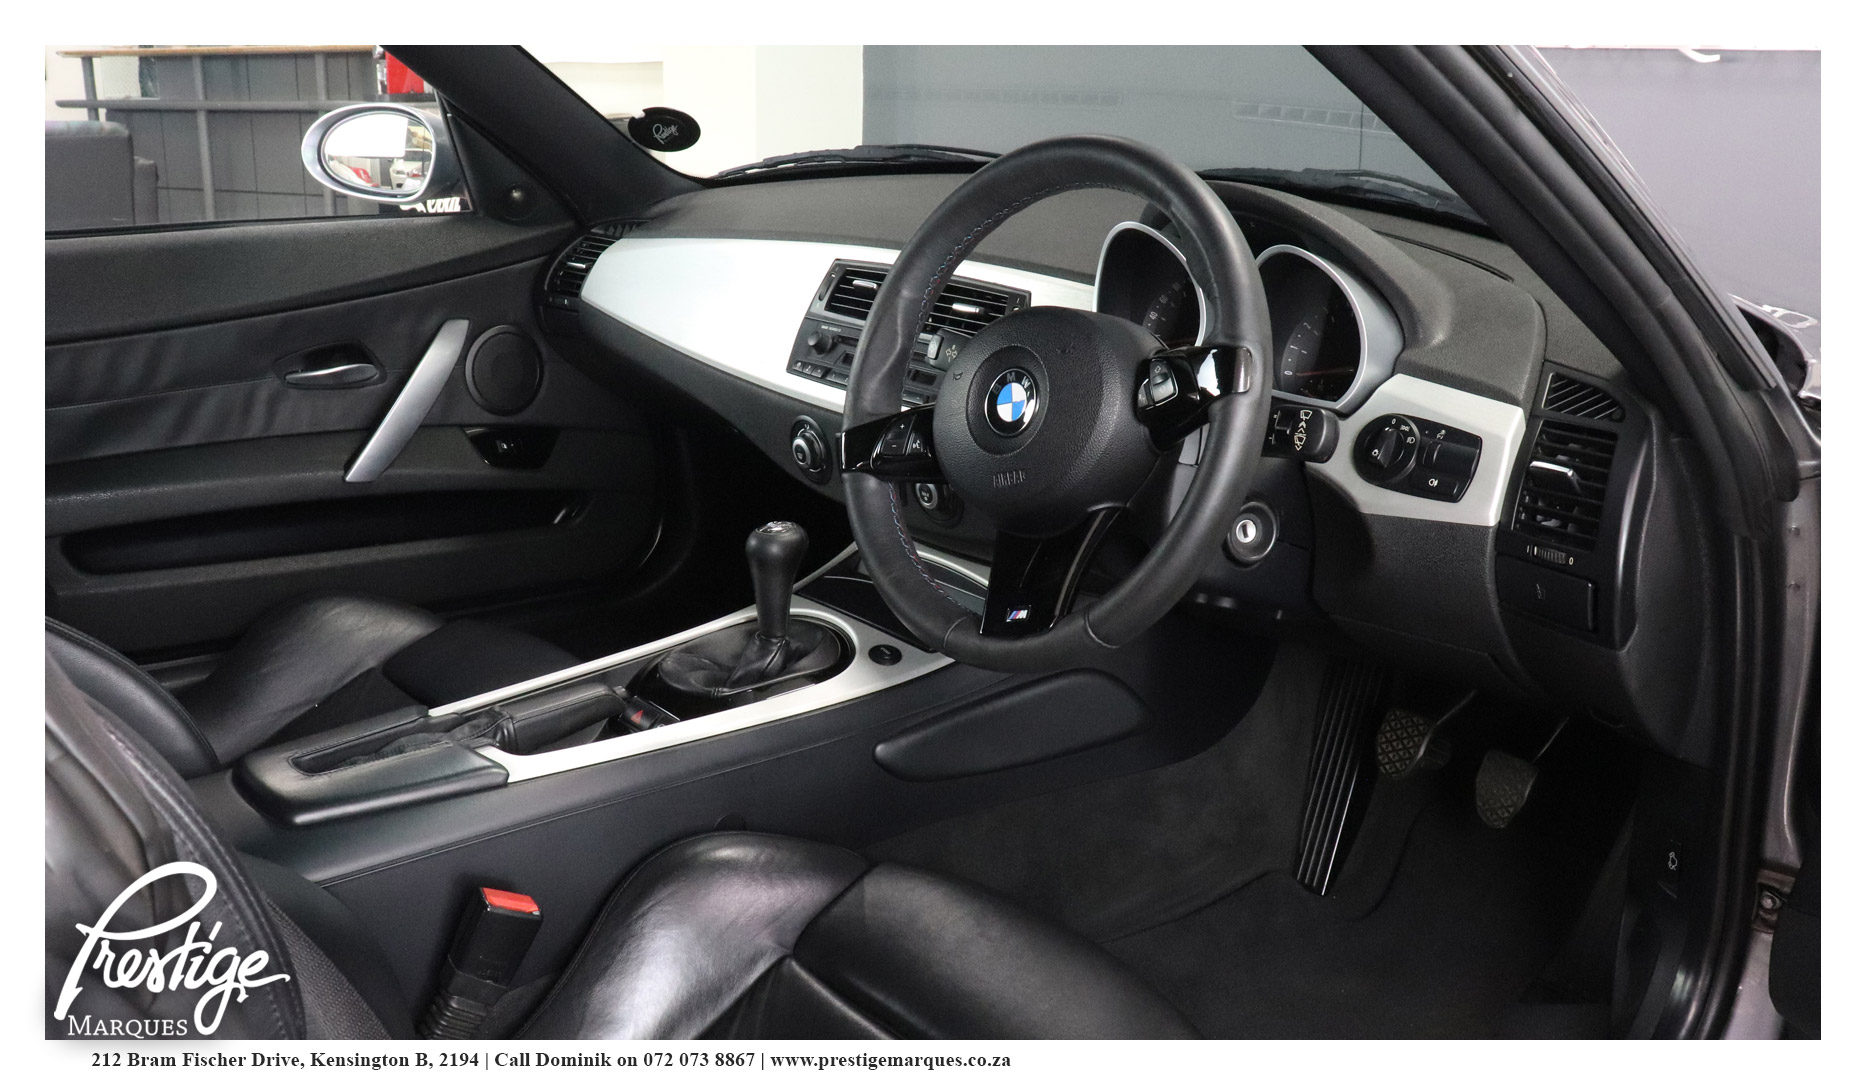 2007-BMW-Z4-M-Coupe-Manual-Prestige-Marques-Randburg-Sandton-11